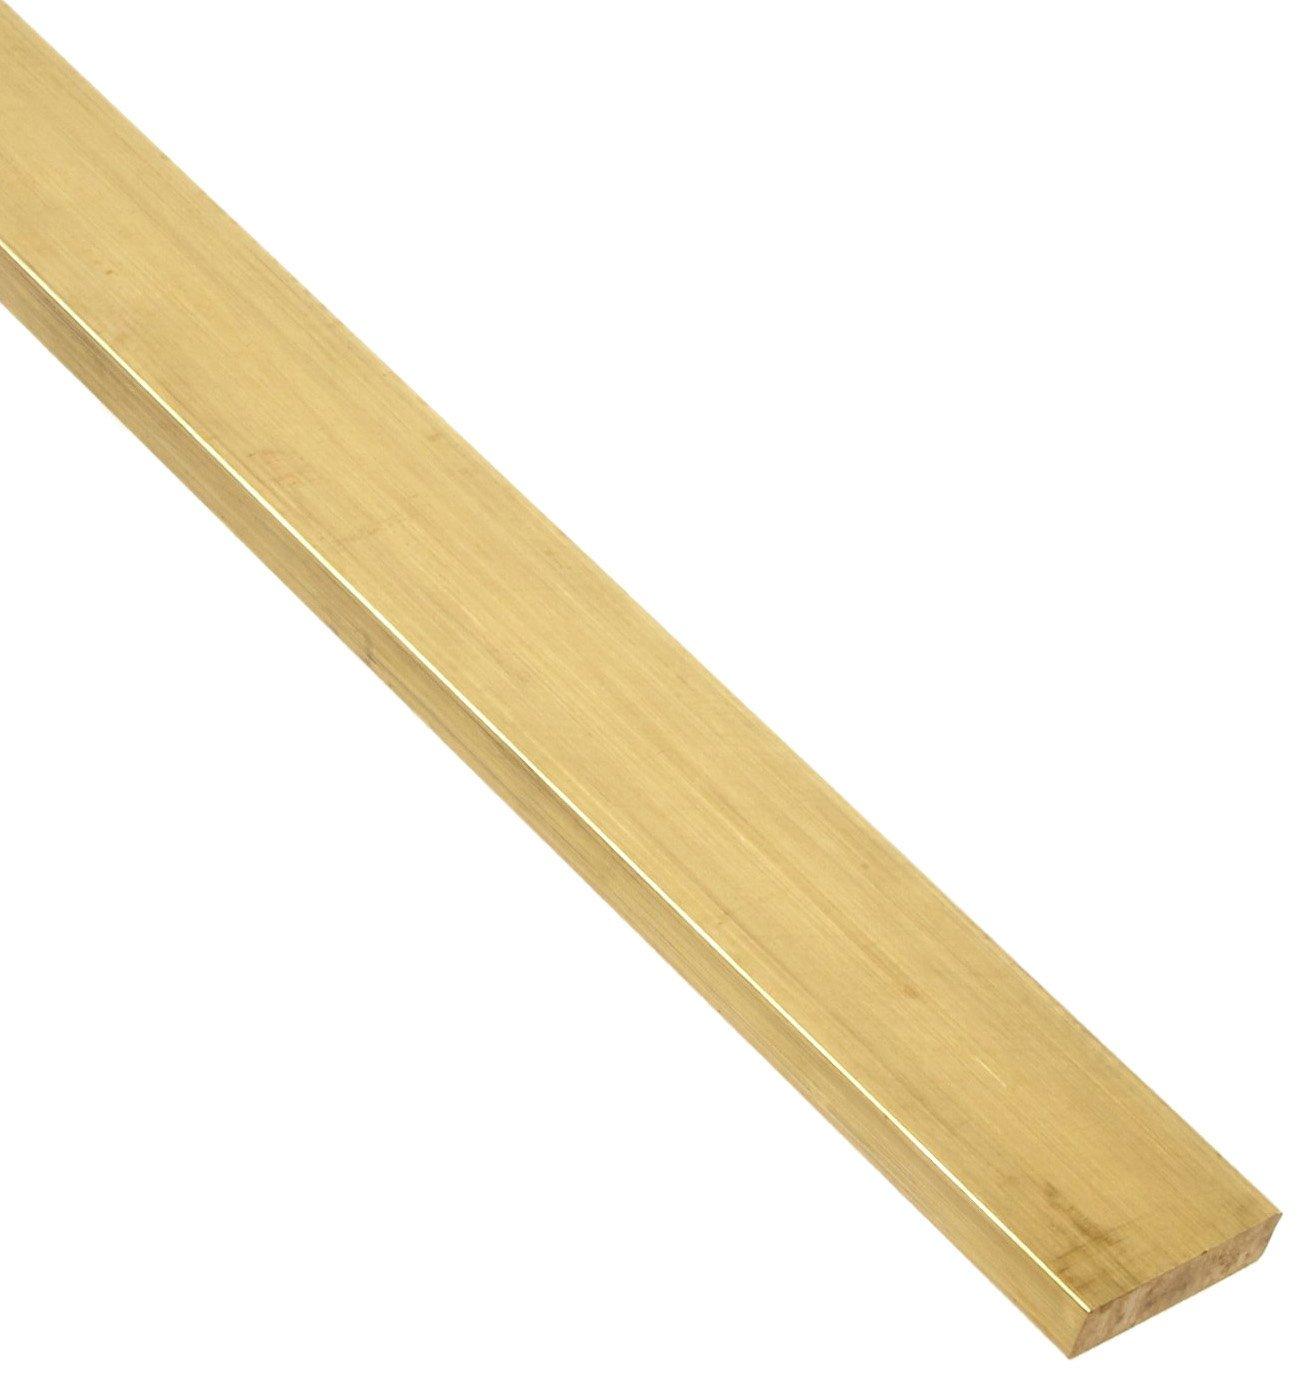 Unpolished 12 Length ASTM B16 H02 Temper Mill Finish 1//2 Width 1//8 Thickness 360 Brass Rectangular Bar